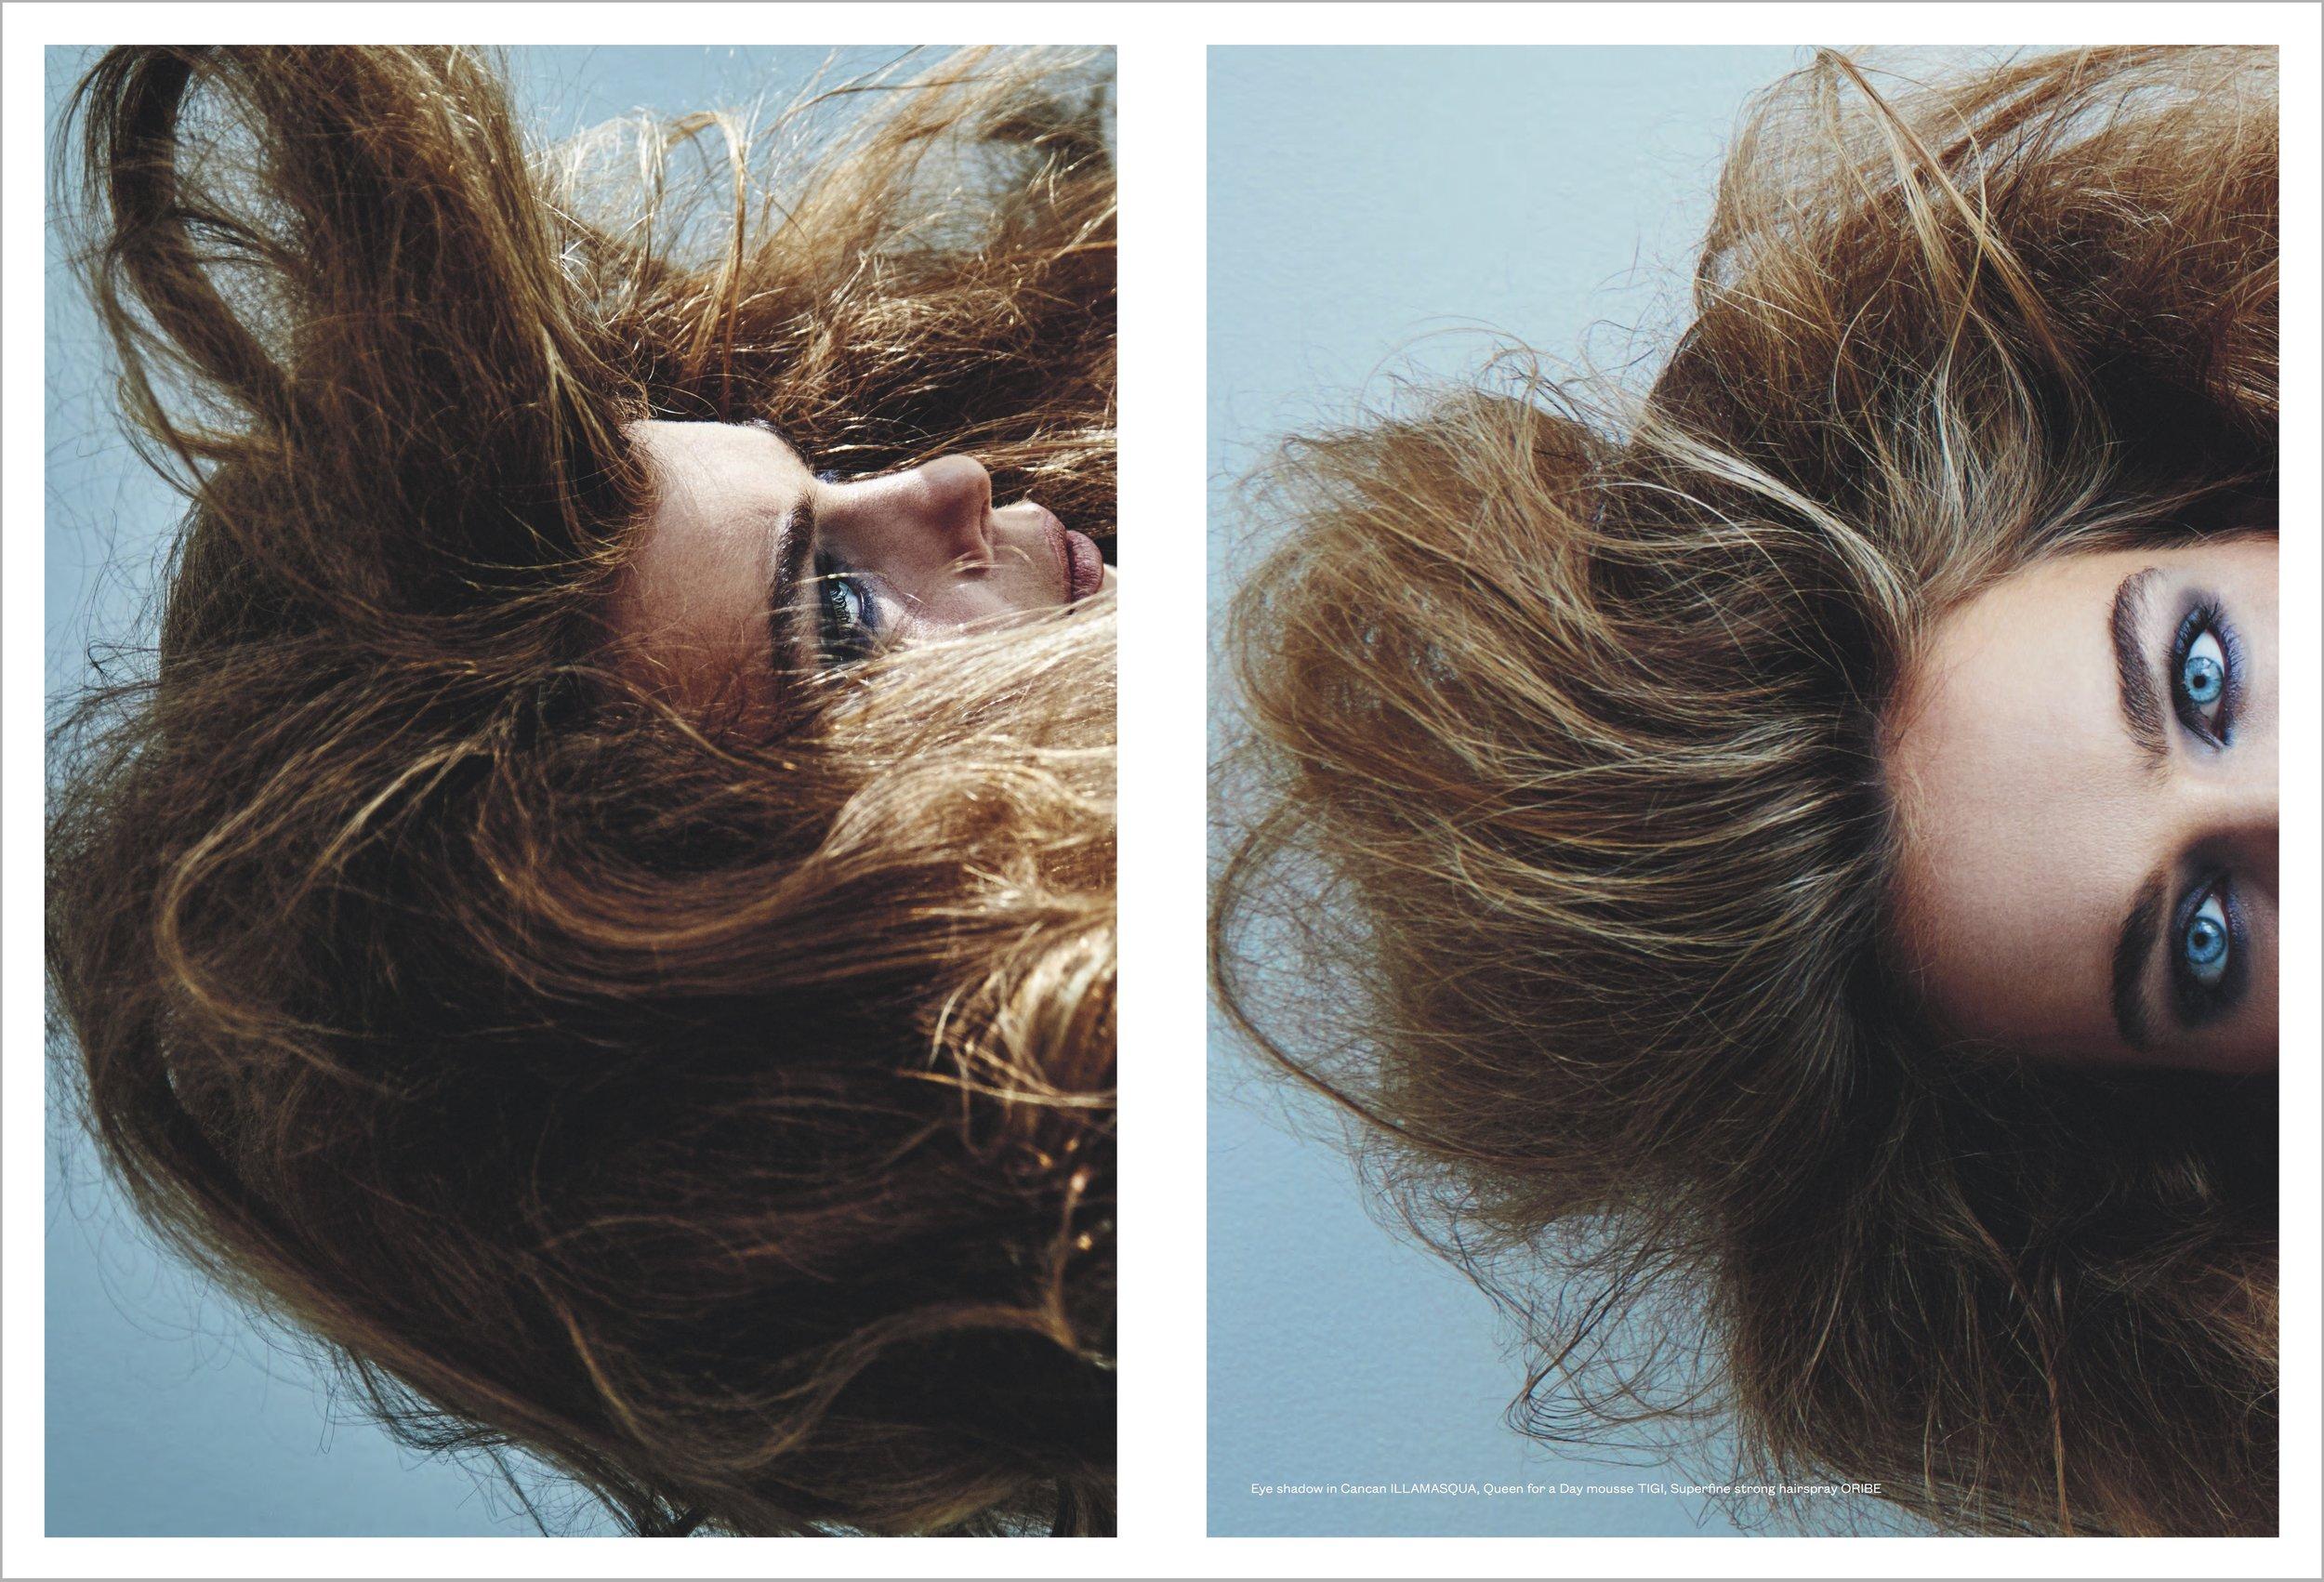 BeautyPapers#5 Mathew Kristal (dragged) 1 copy3.jpg